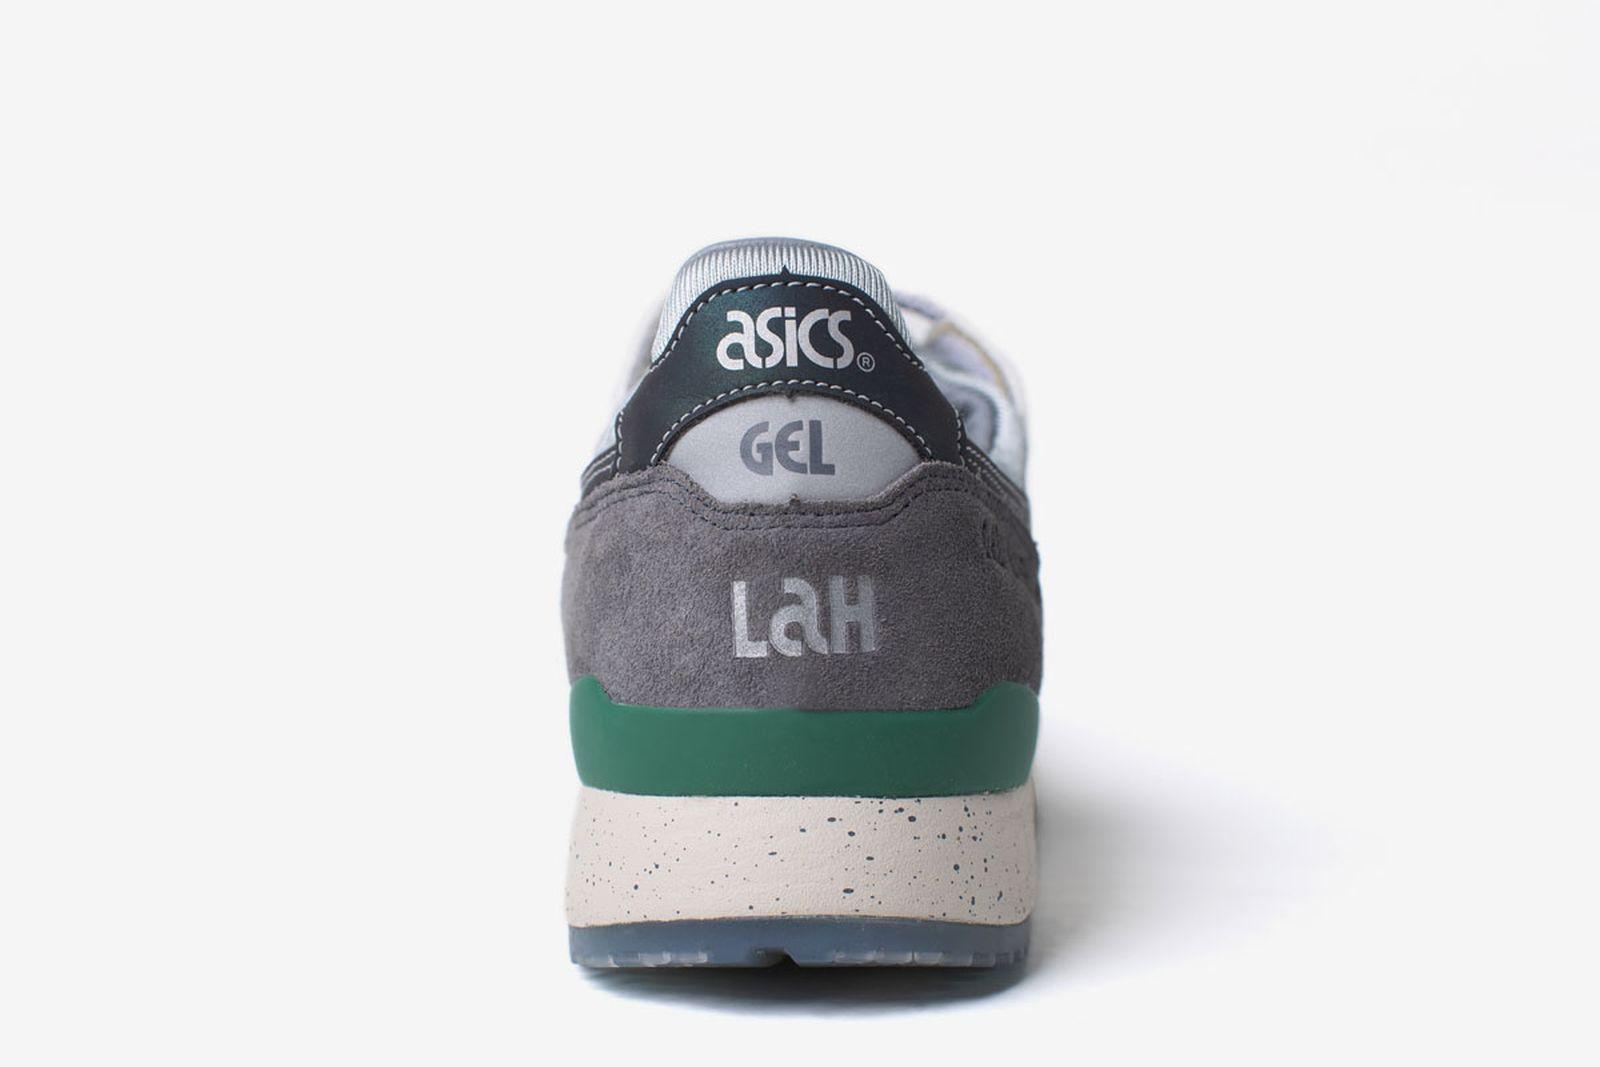 sneakerlah-asics-gel-lyte-3-petronas-twin-towers-release-date-price-01